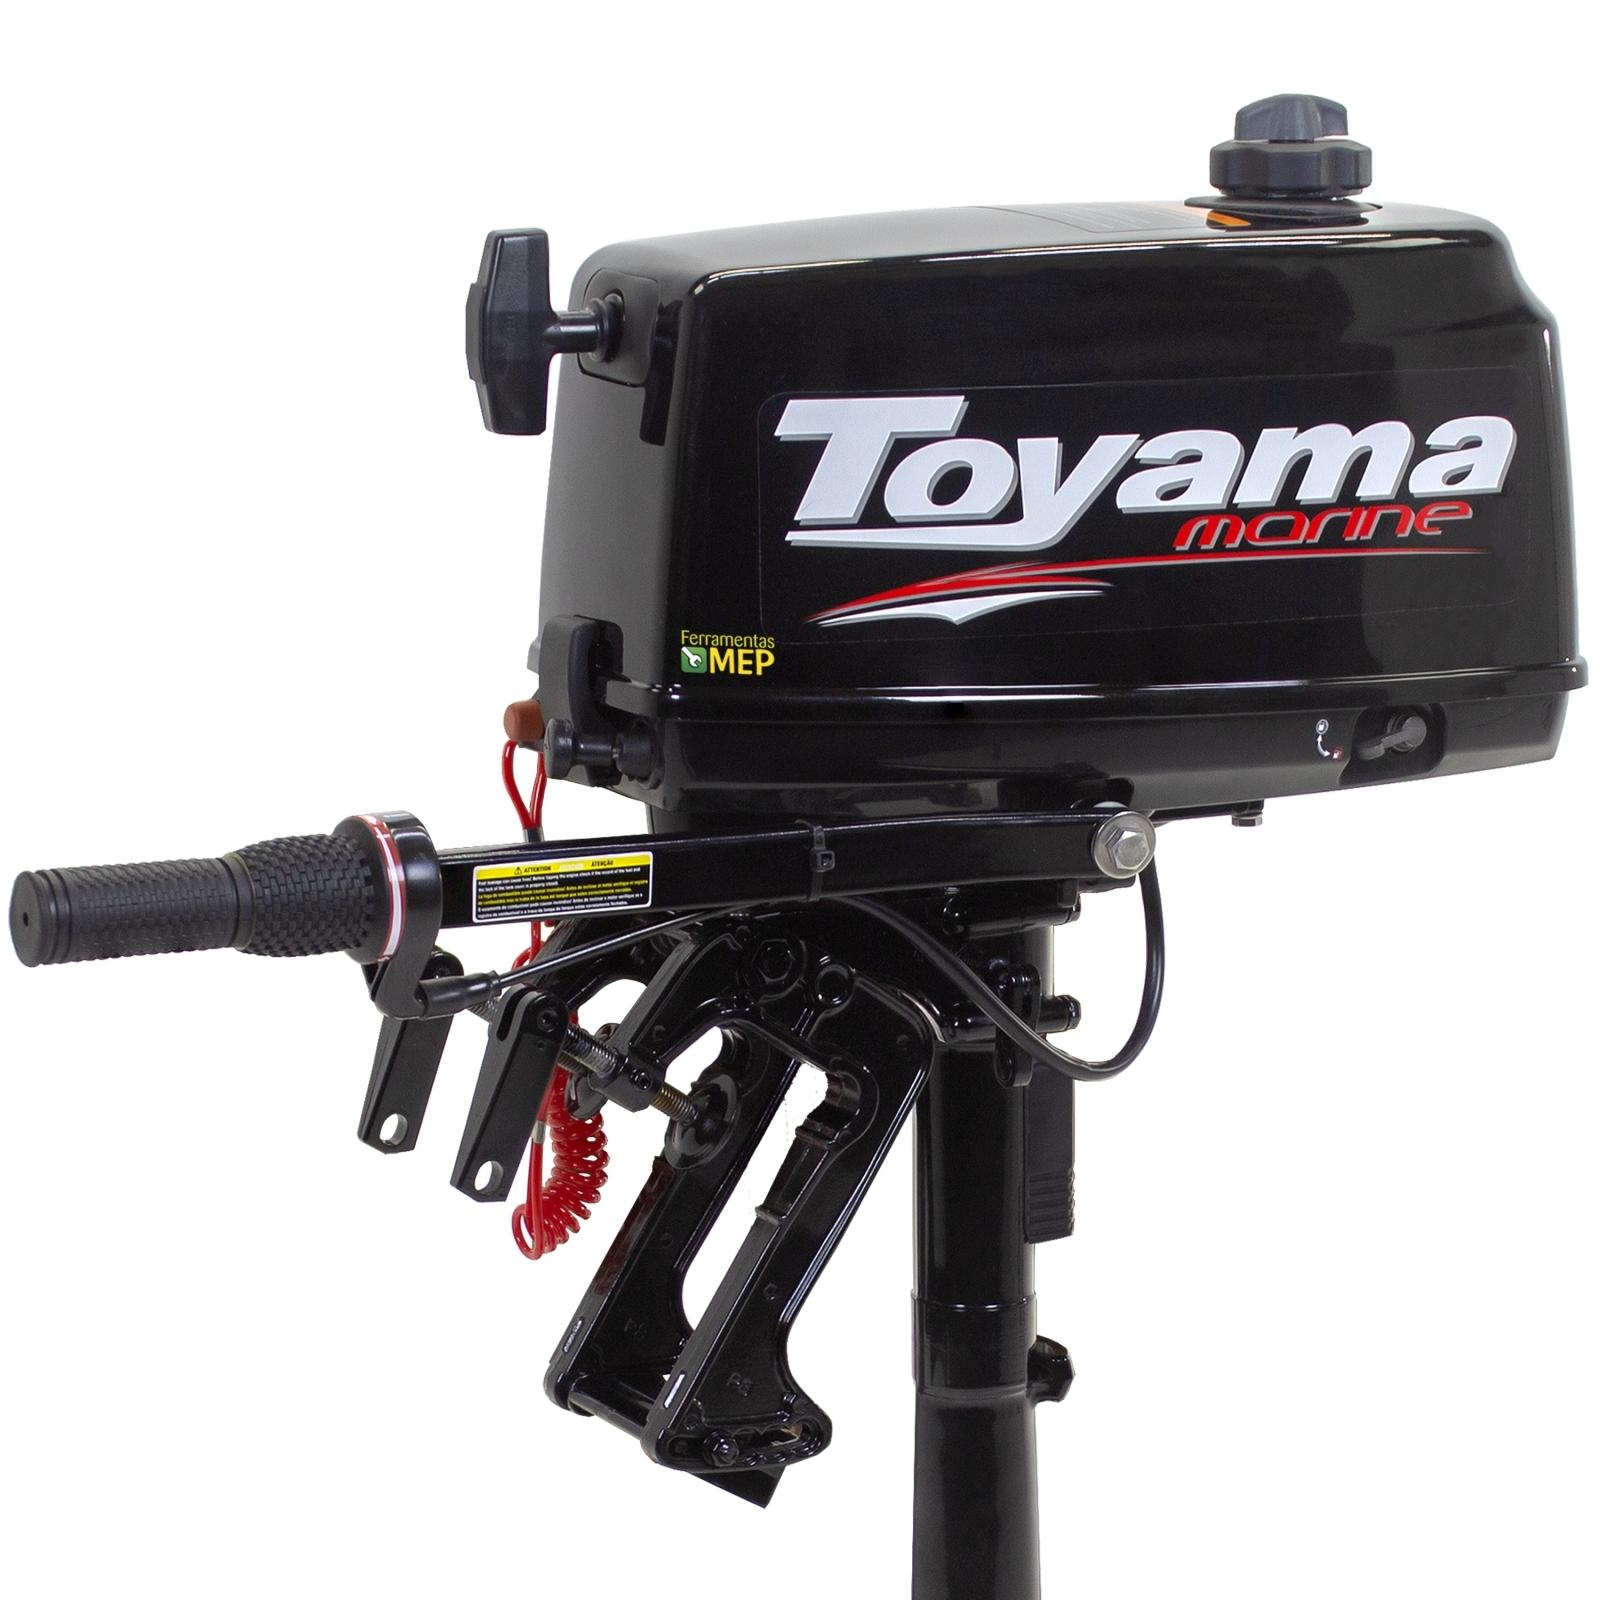 Motor De Popa Toyama TM2,6TS 2,6hp 2t Refrigerado A Água Rb2 - Ferramentas MEP